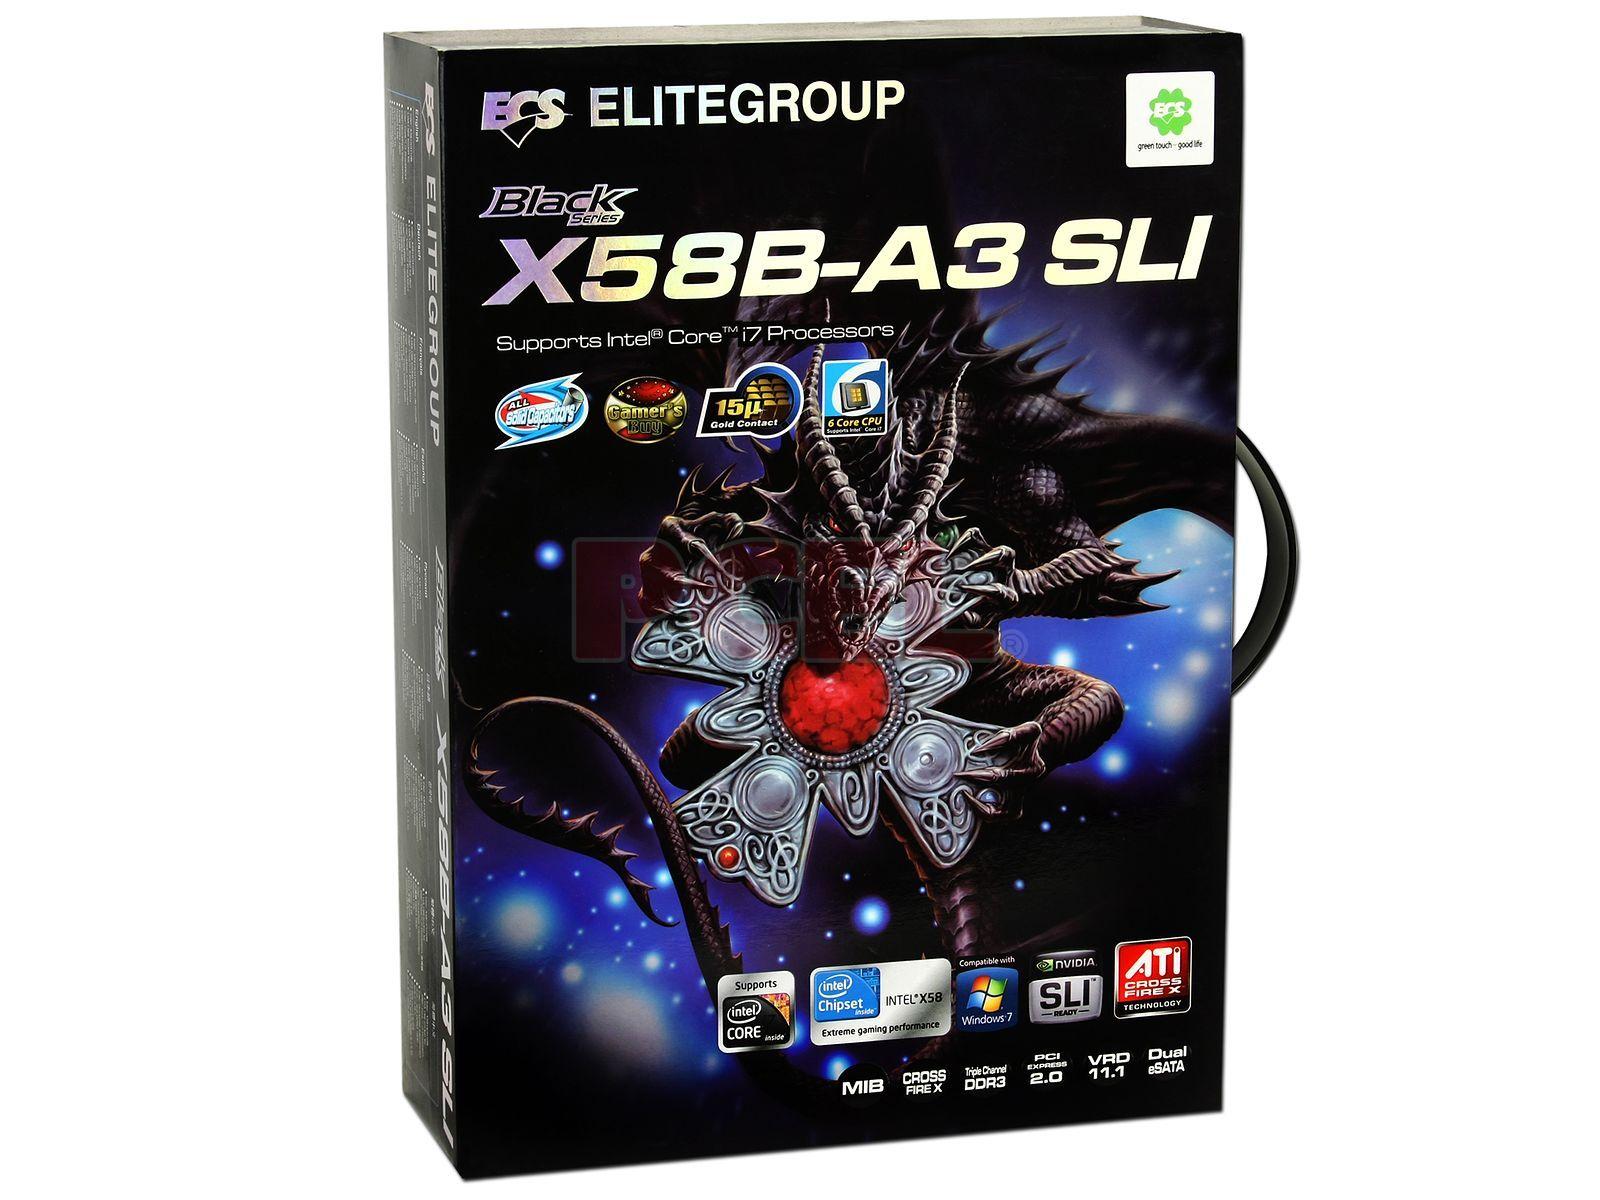 ECS X58B-A3 SLI V1.0 JMICRON RAID TREIBER WINDOWS 7